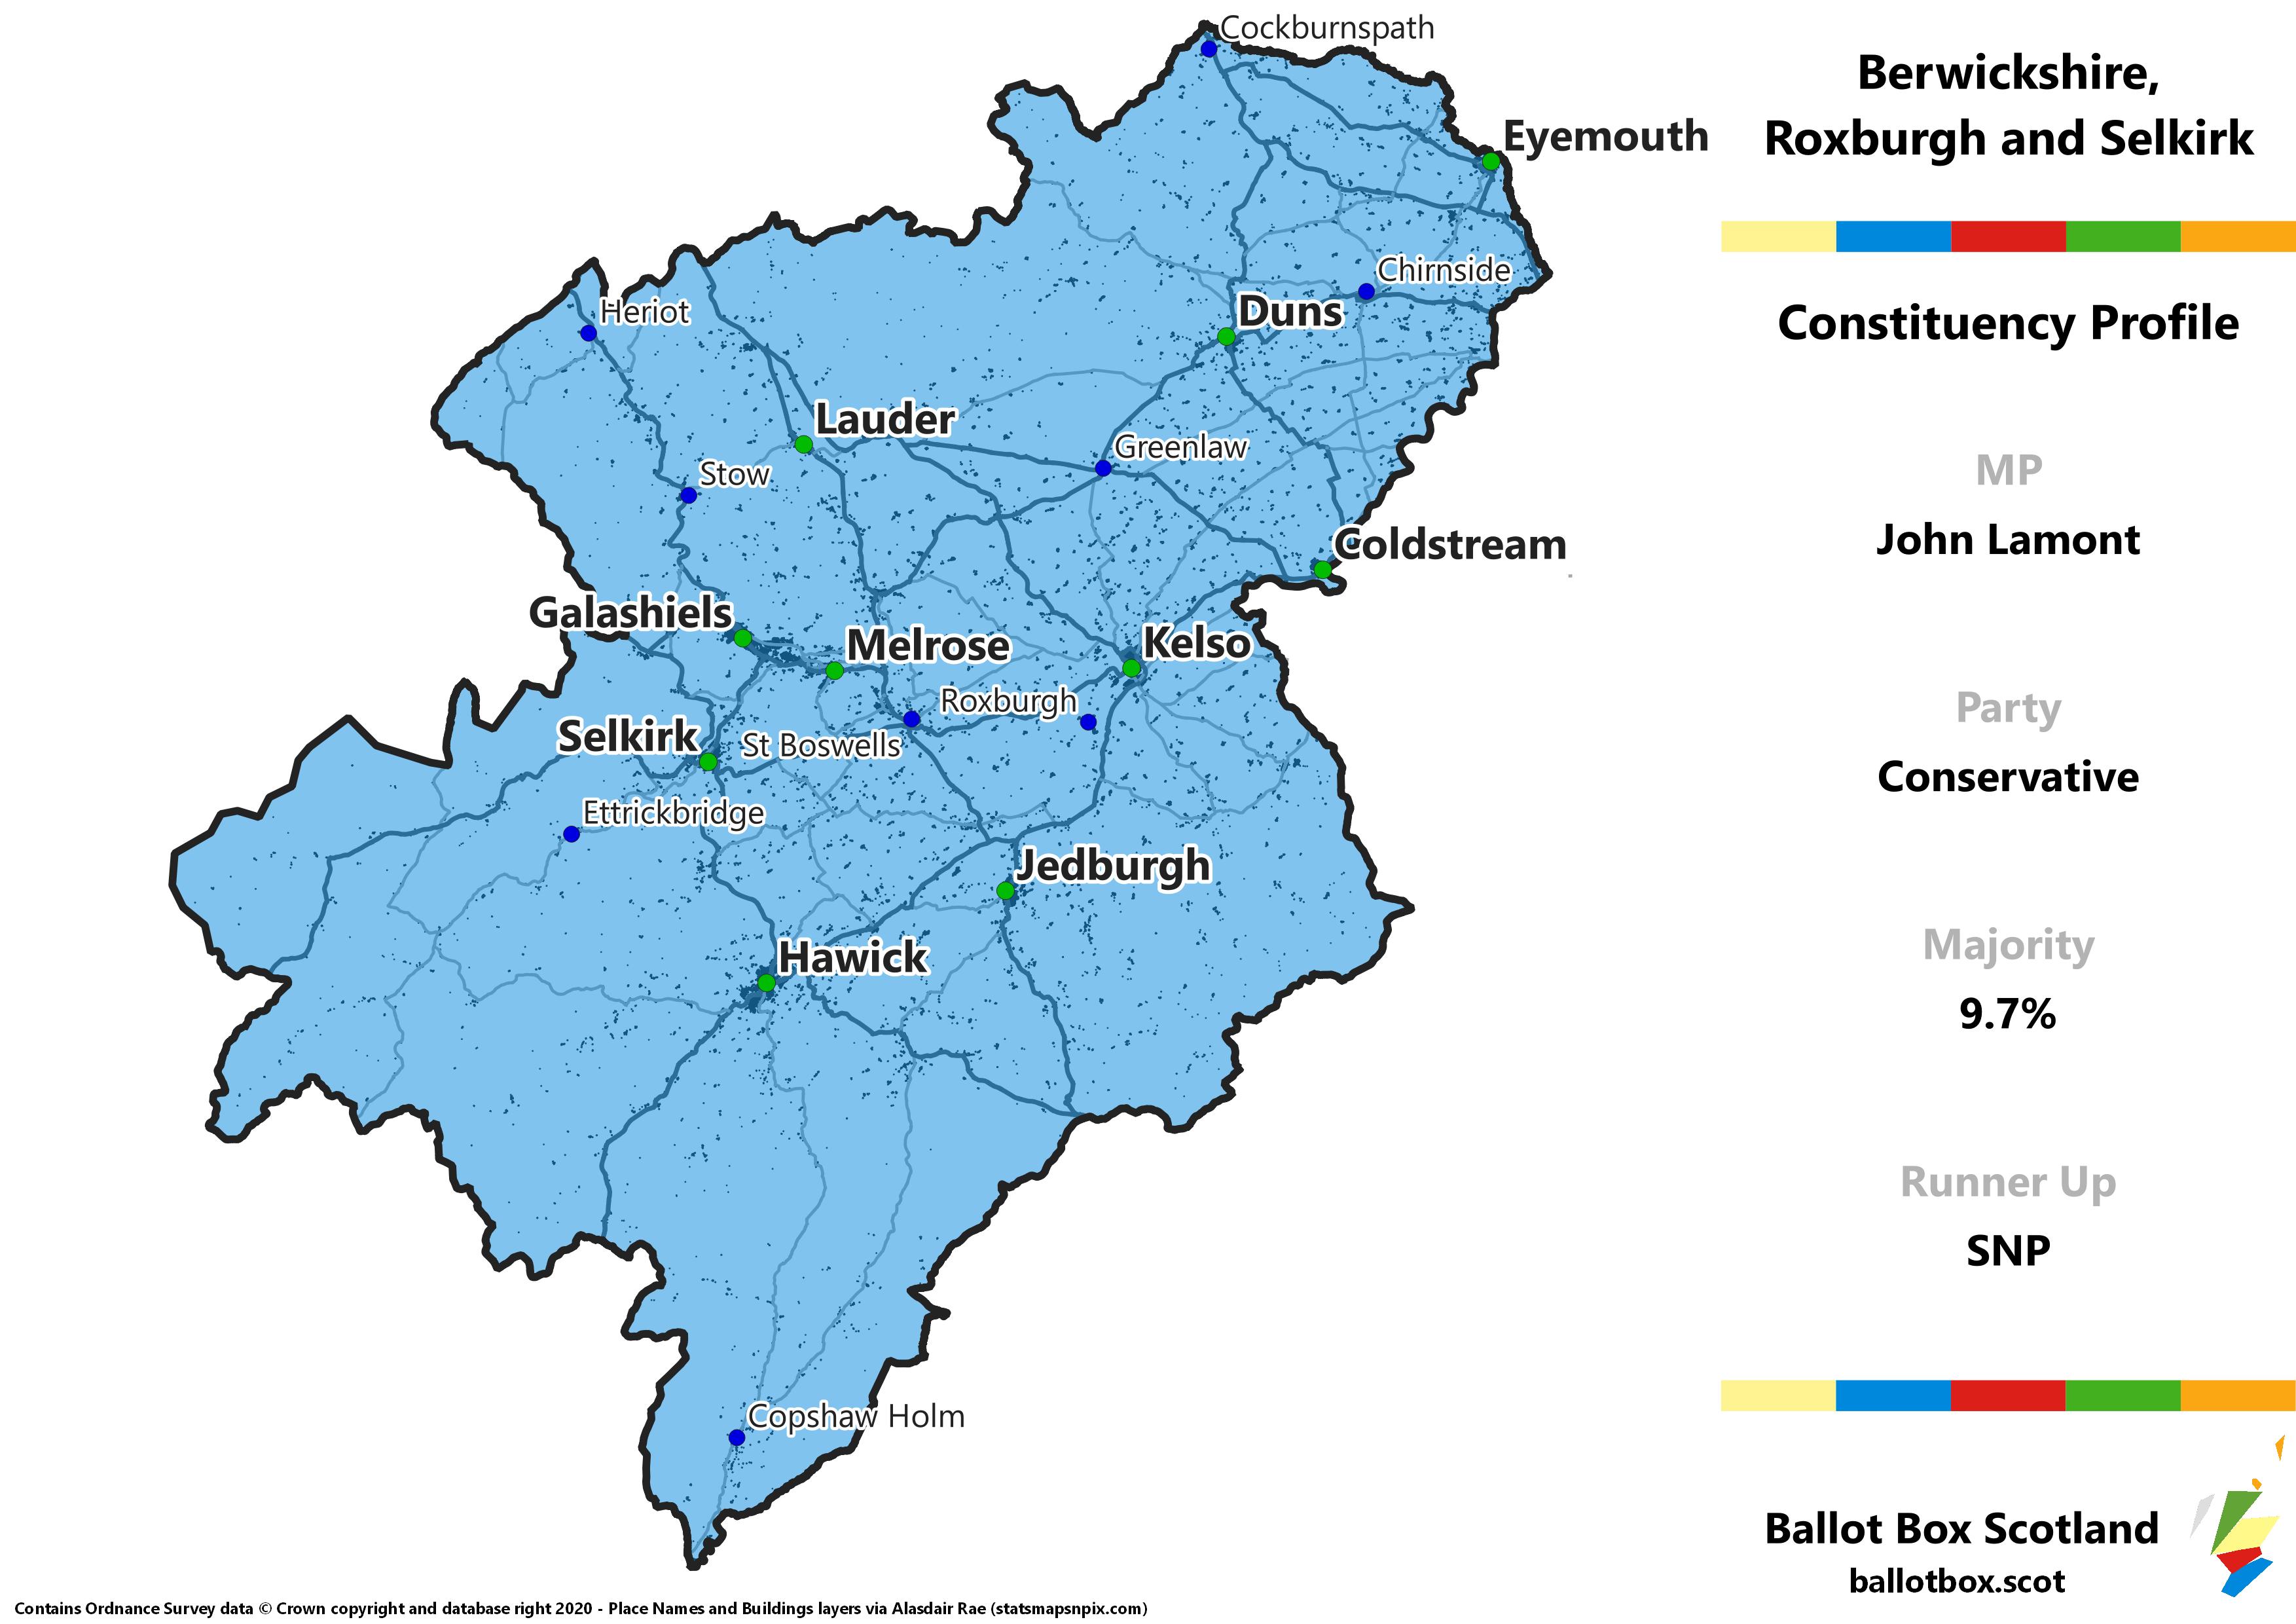 Berwickshire, Roxburgh and Selkirk Constituency Map